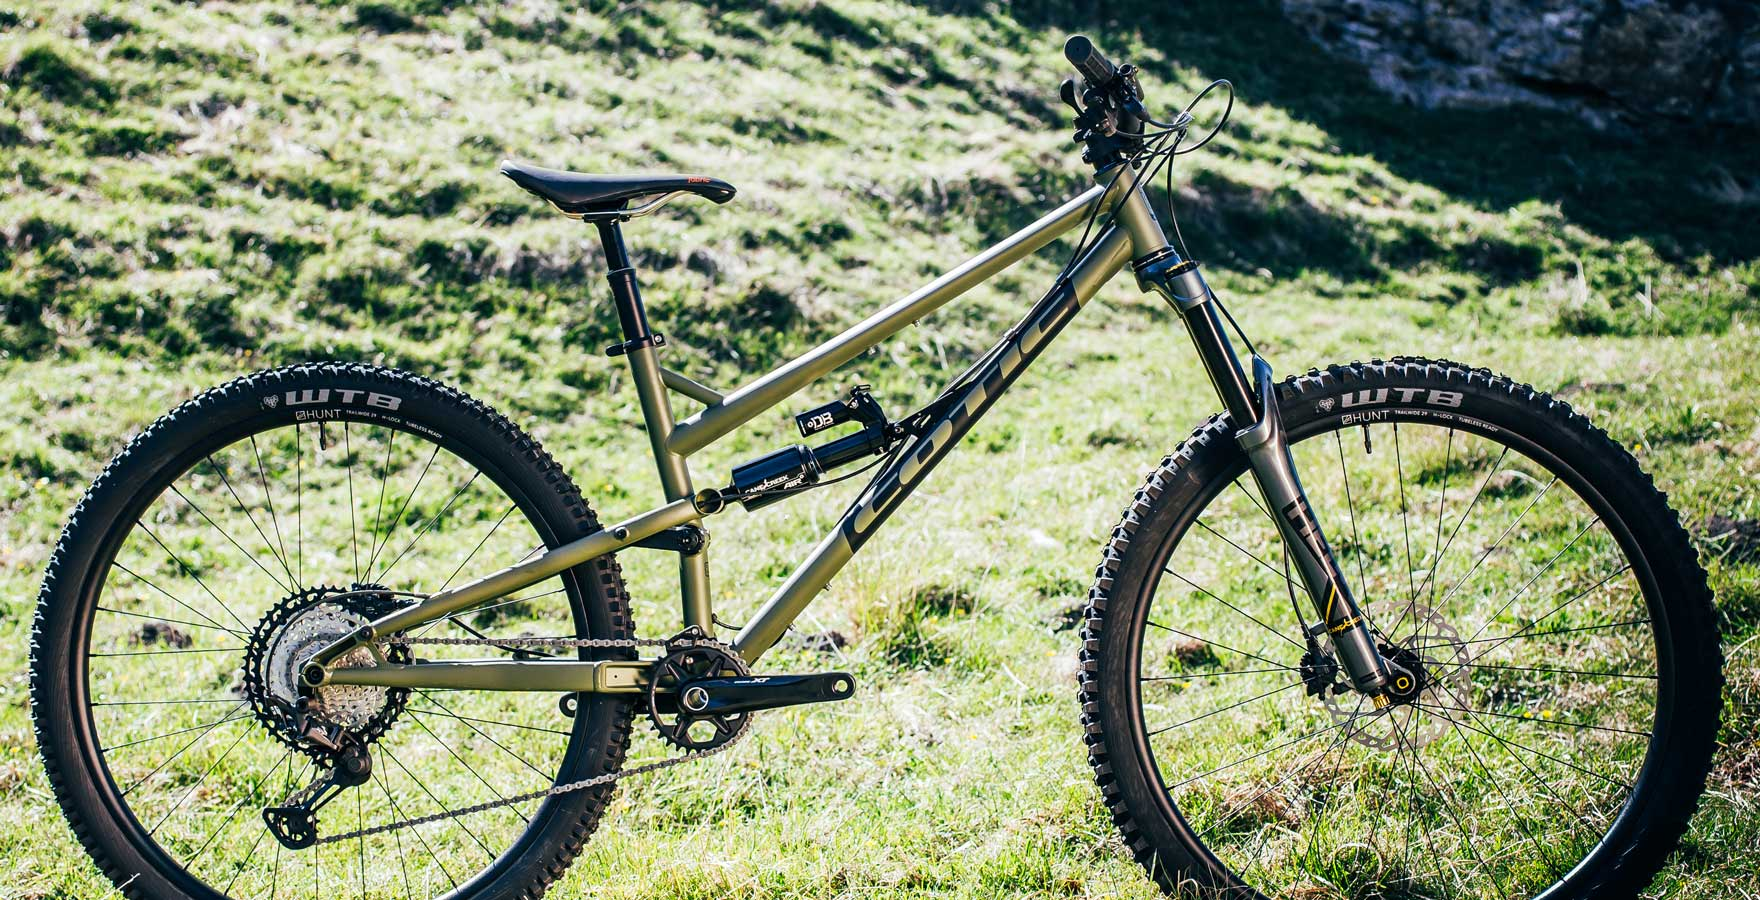 cotic rocketmax, rocketmax gen3, 160mm enduro bike, review, reynolds 853, steel full suspension, 29er enduro bike, uk made, uk made mountain bike